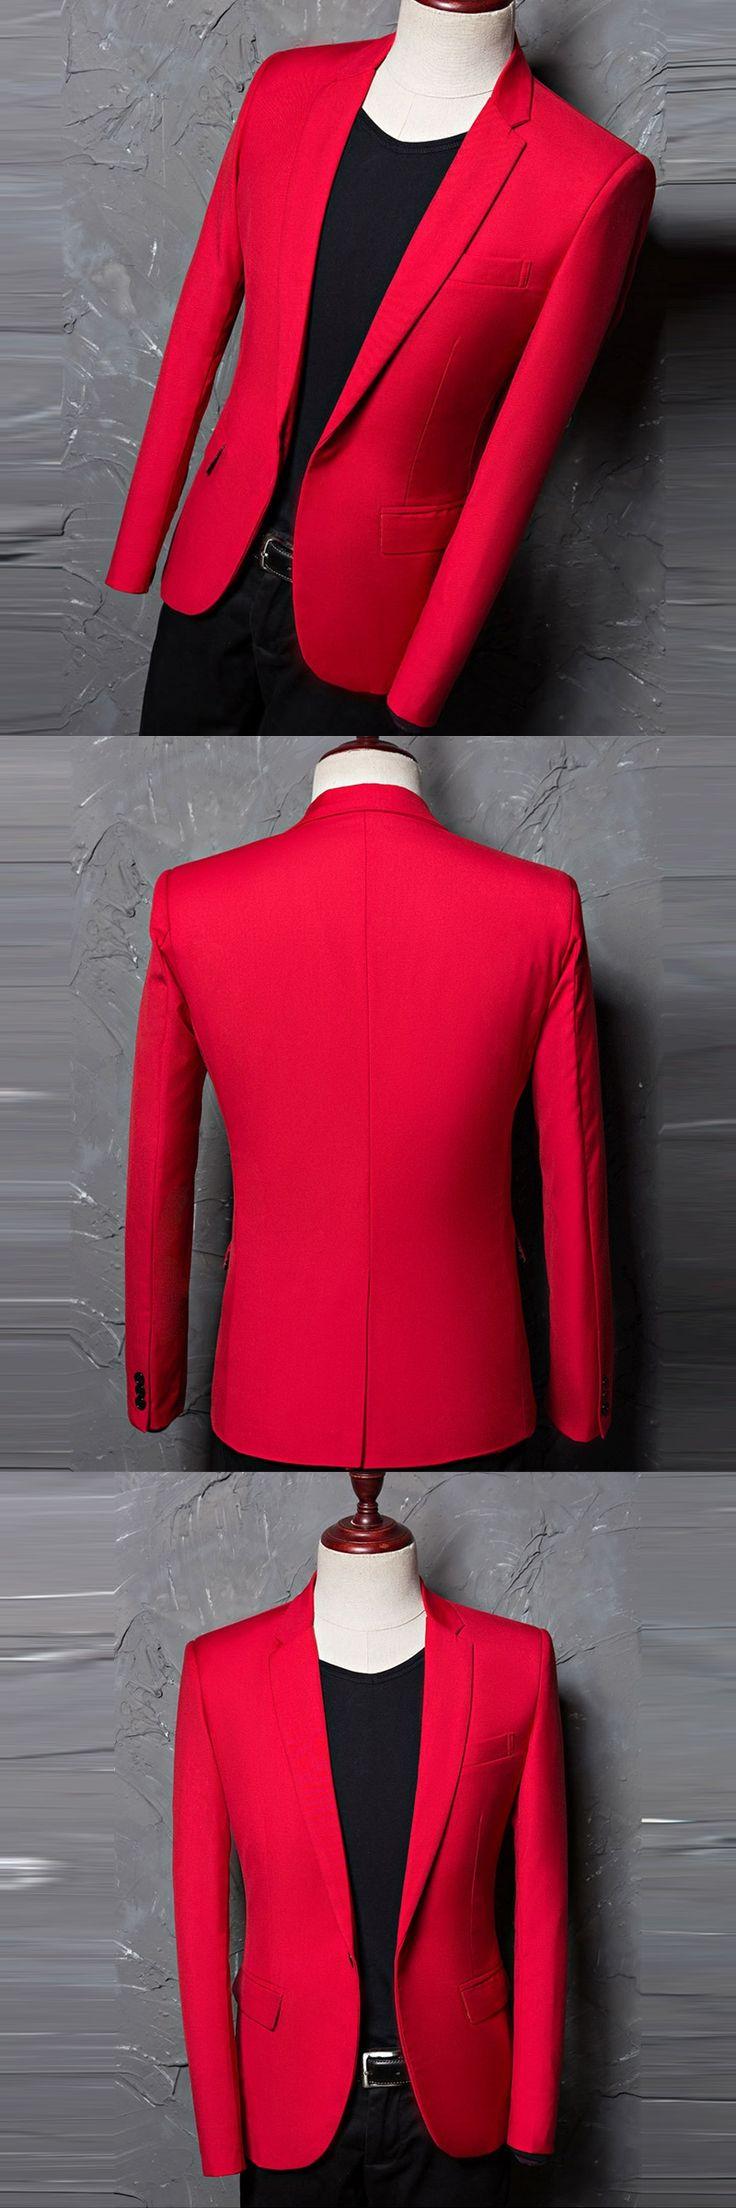 Red Blazer men 2017 New Fashion Men Jacket Casual Designer Brand Costume Homme Men suit Blazers Printed 984618